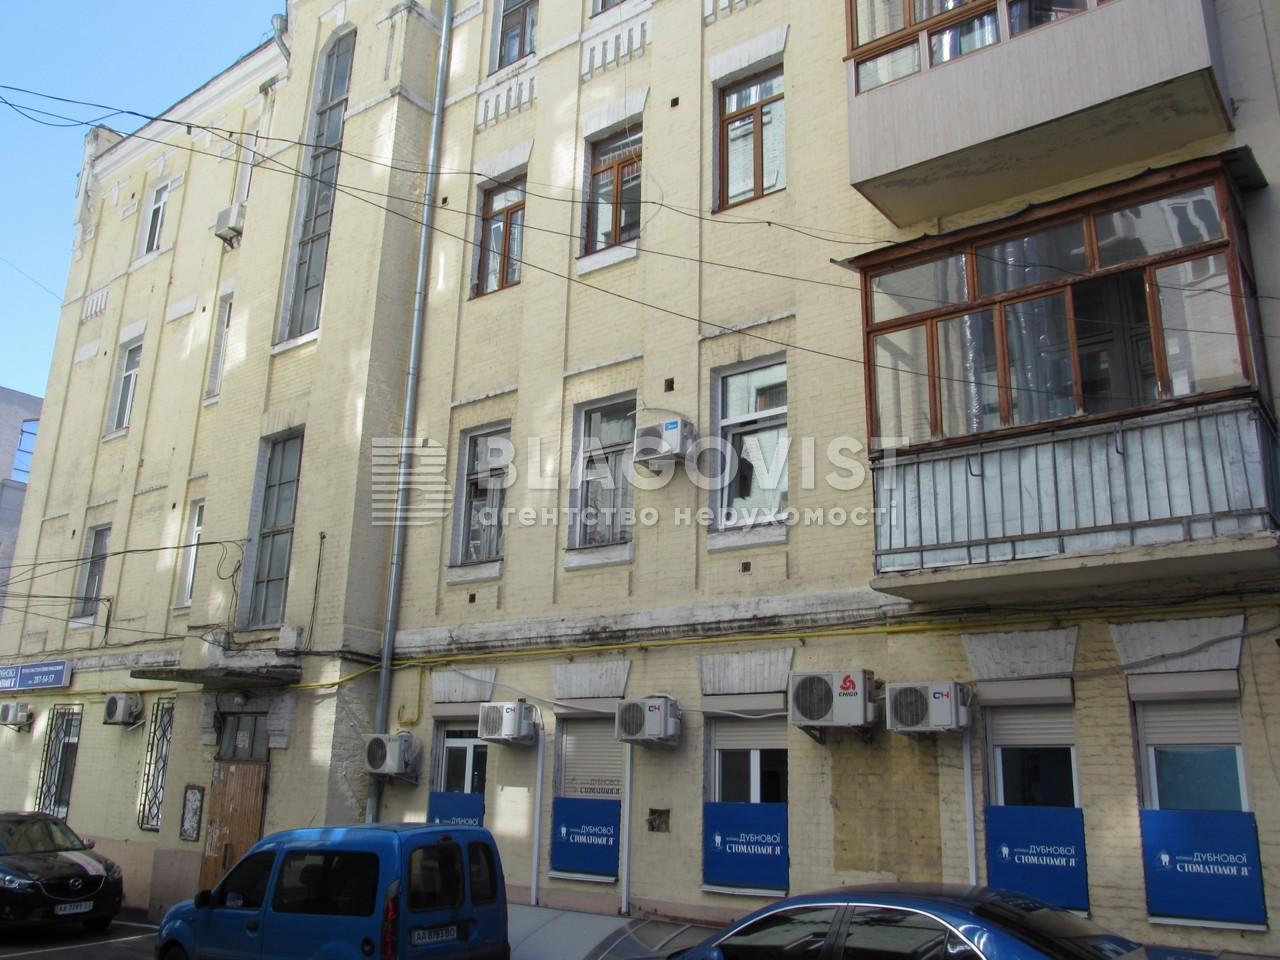 Квартира A-110978, Антоновича (Горького), 28, Киев - Фото 2